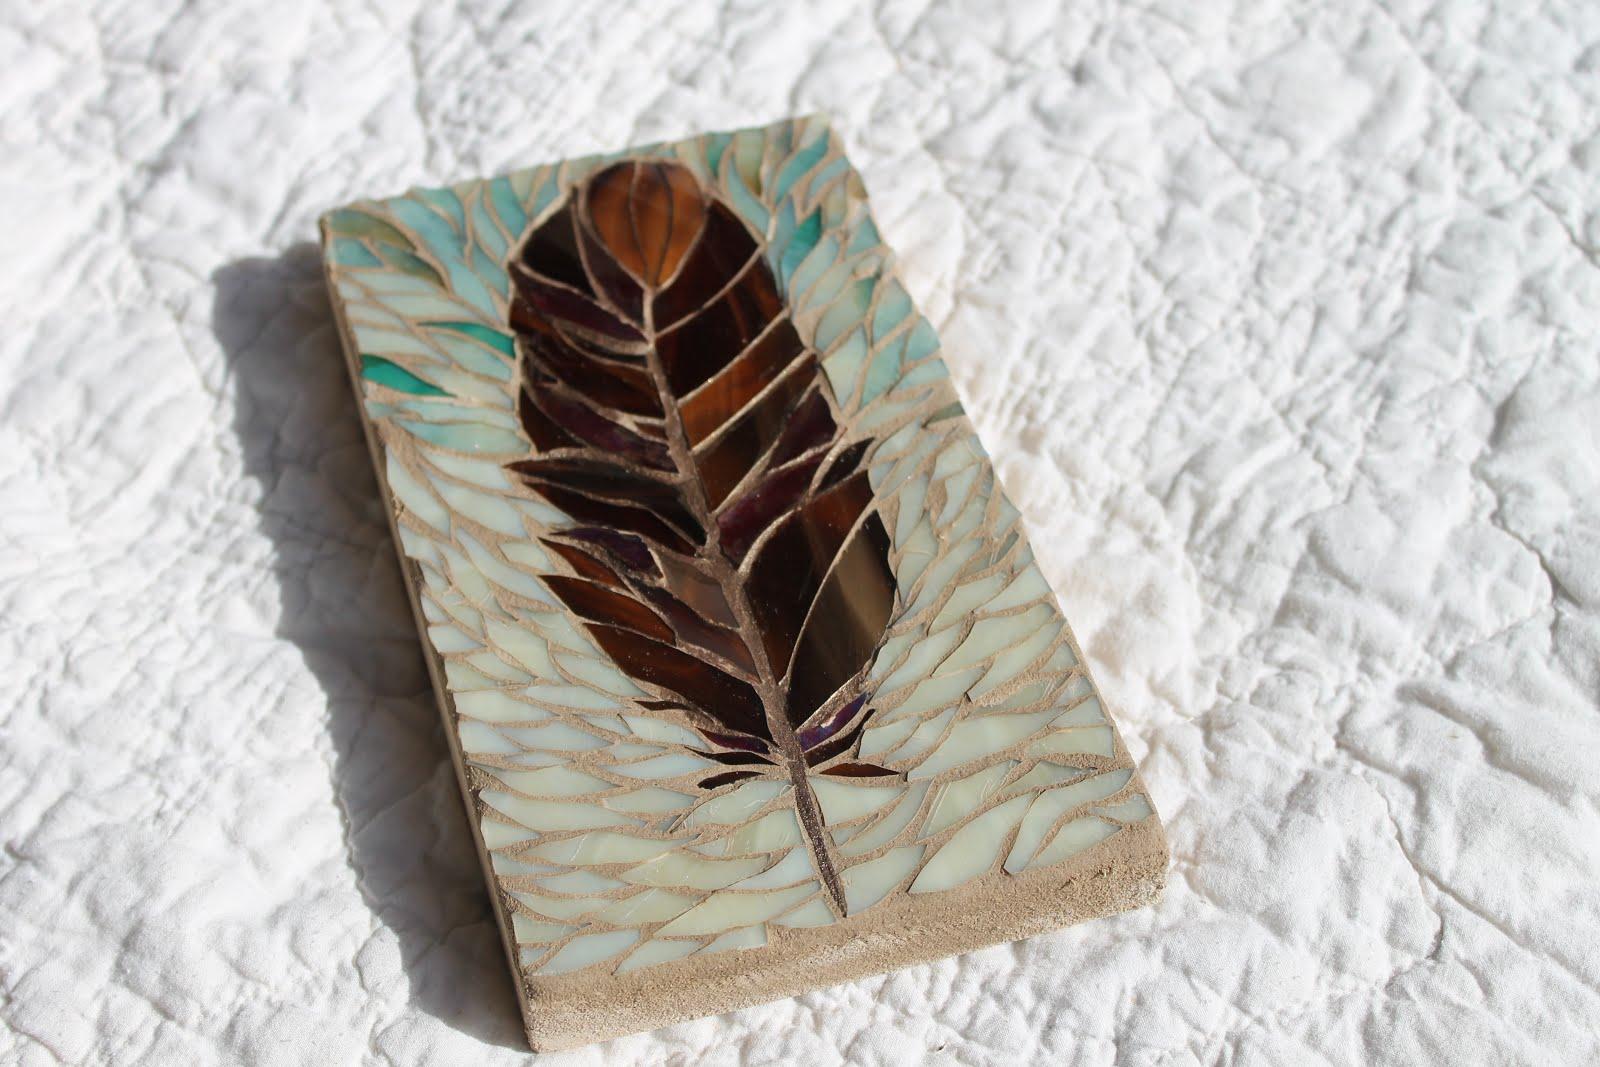 Mosaic Study: Feather